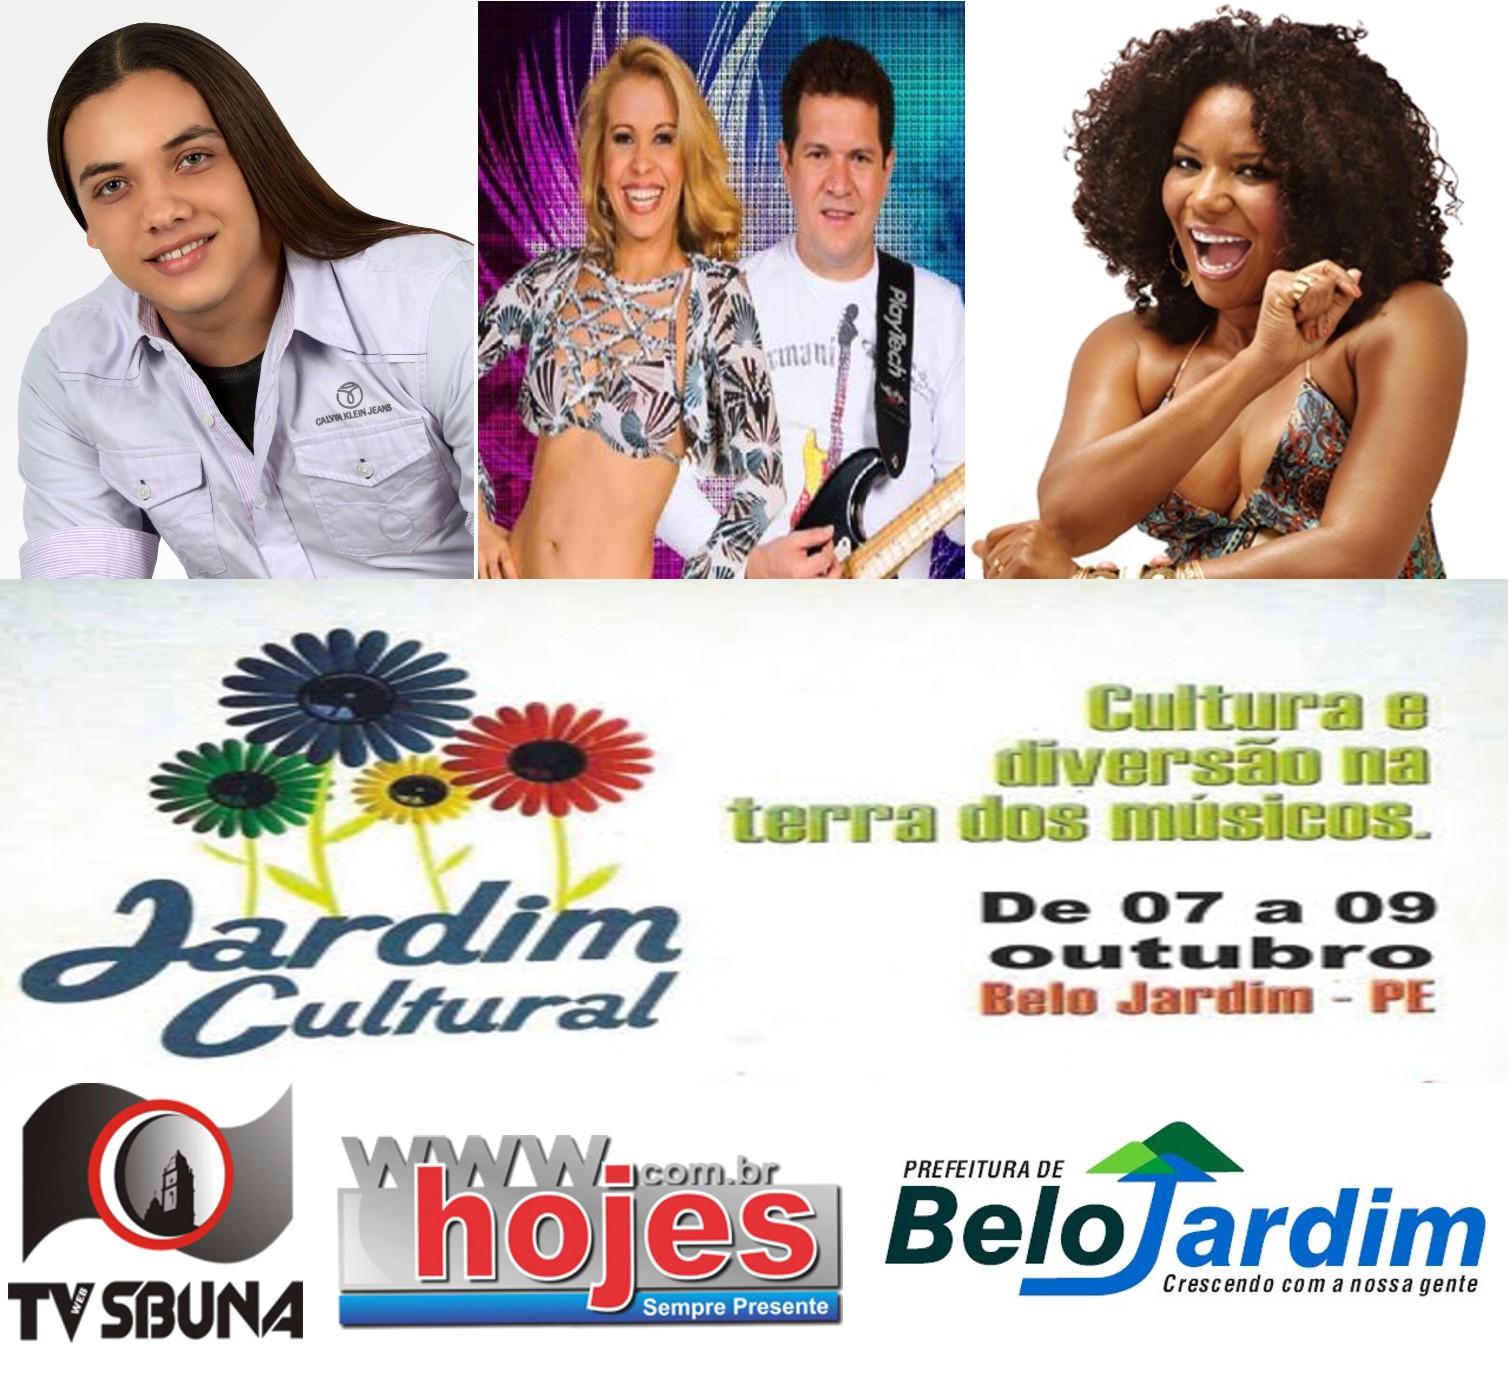 fotos jardim cultural:Prefeitura de Belo Jardim divulga programação do Jardim Cultural